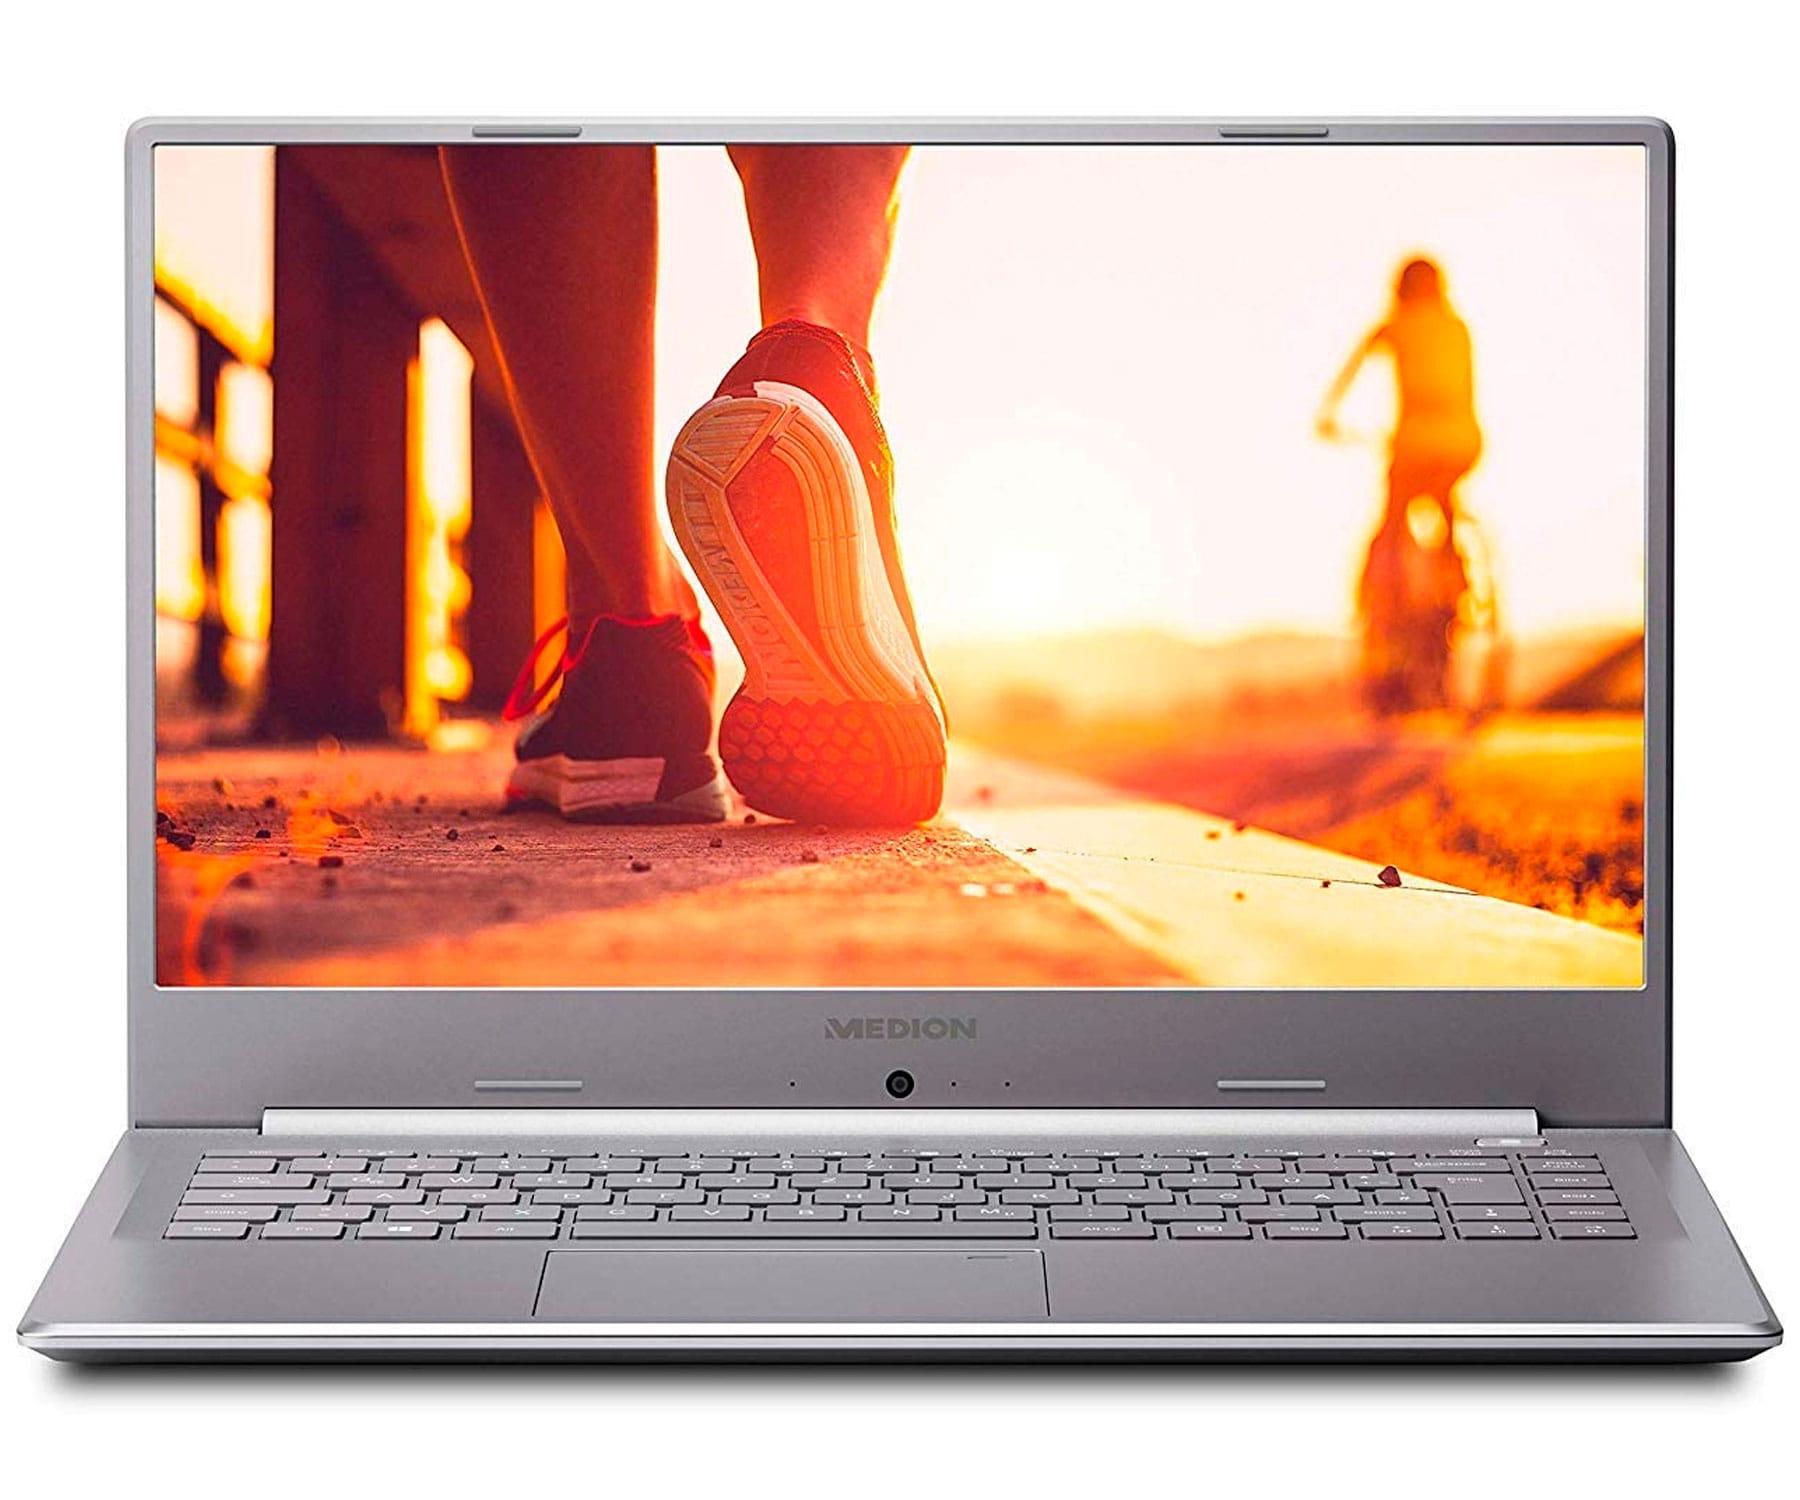 MEDION P6645 PLATA PORTÁTIL ULTRAFINO 15.6'' FullHD i5-8264U 3.9GHz 256GB-SSD 1TB-HDD 8GB RAM GFMX150-2GB WIN10 HOME